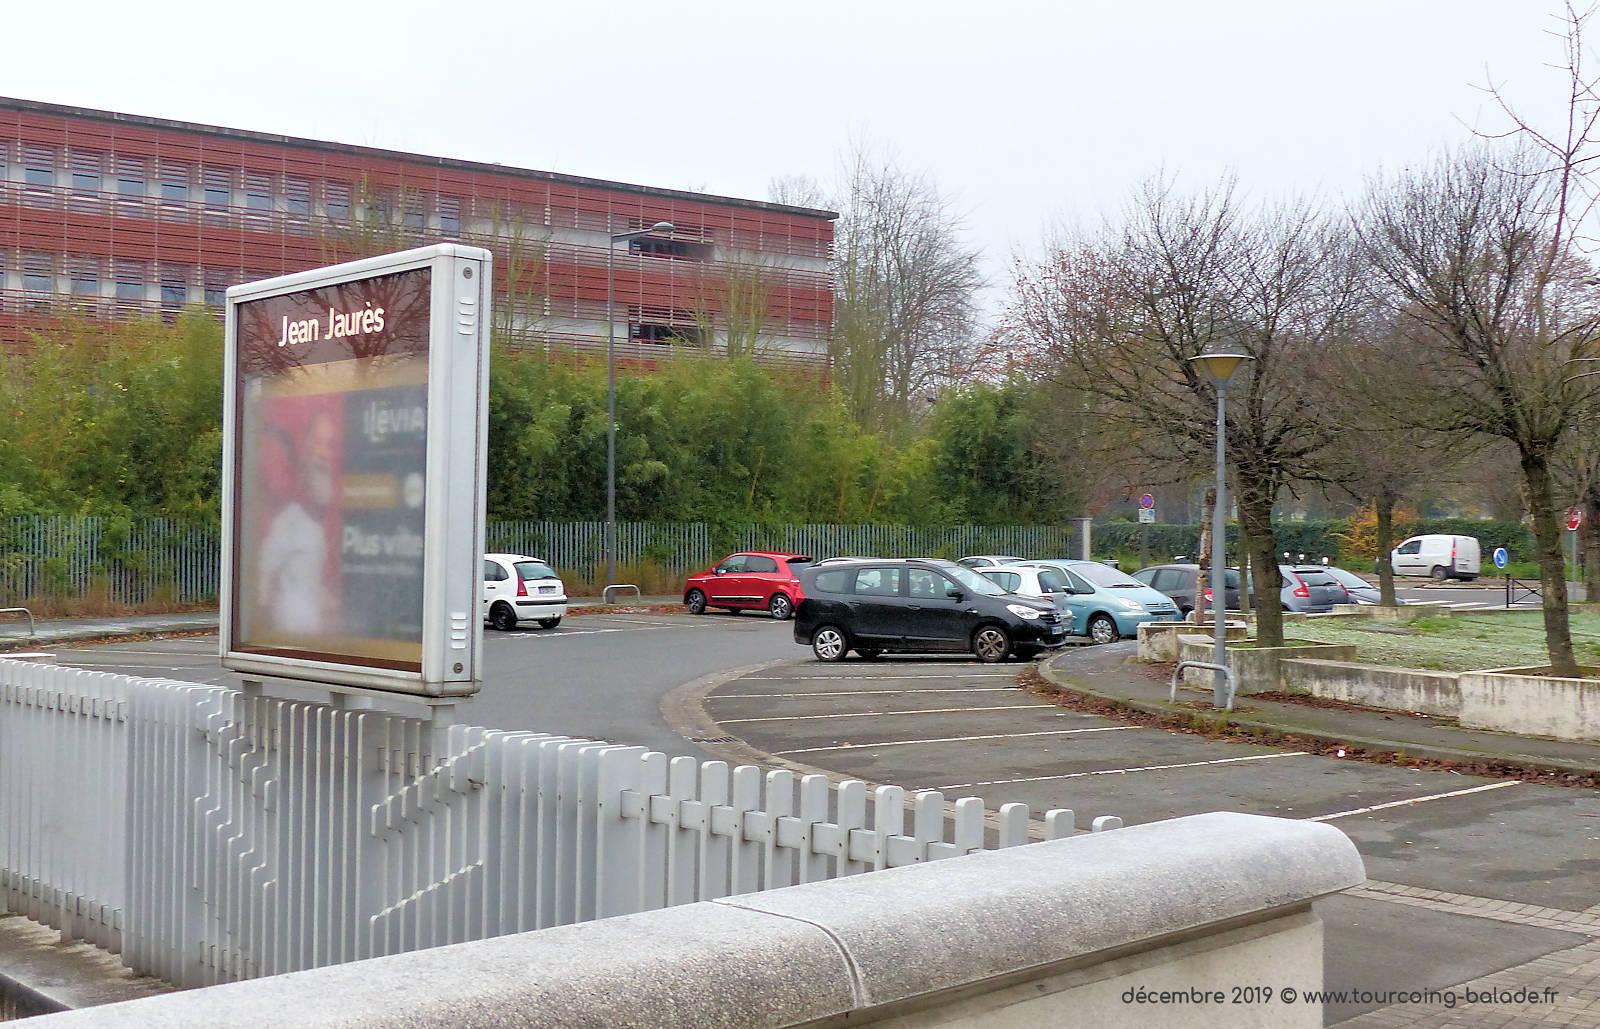 Groupe Vilogia siège Social - Métro Lille ligne 2 - Station Jean Jaurès